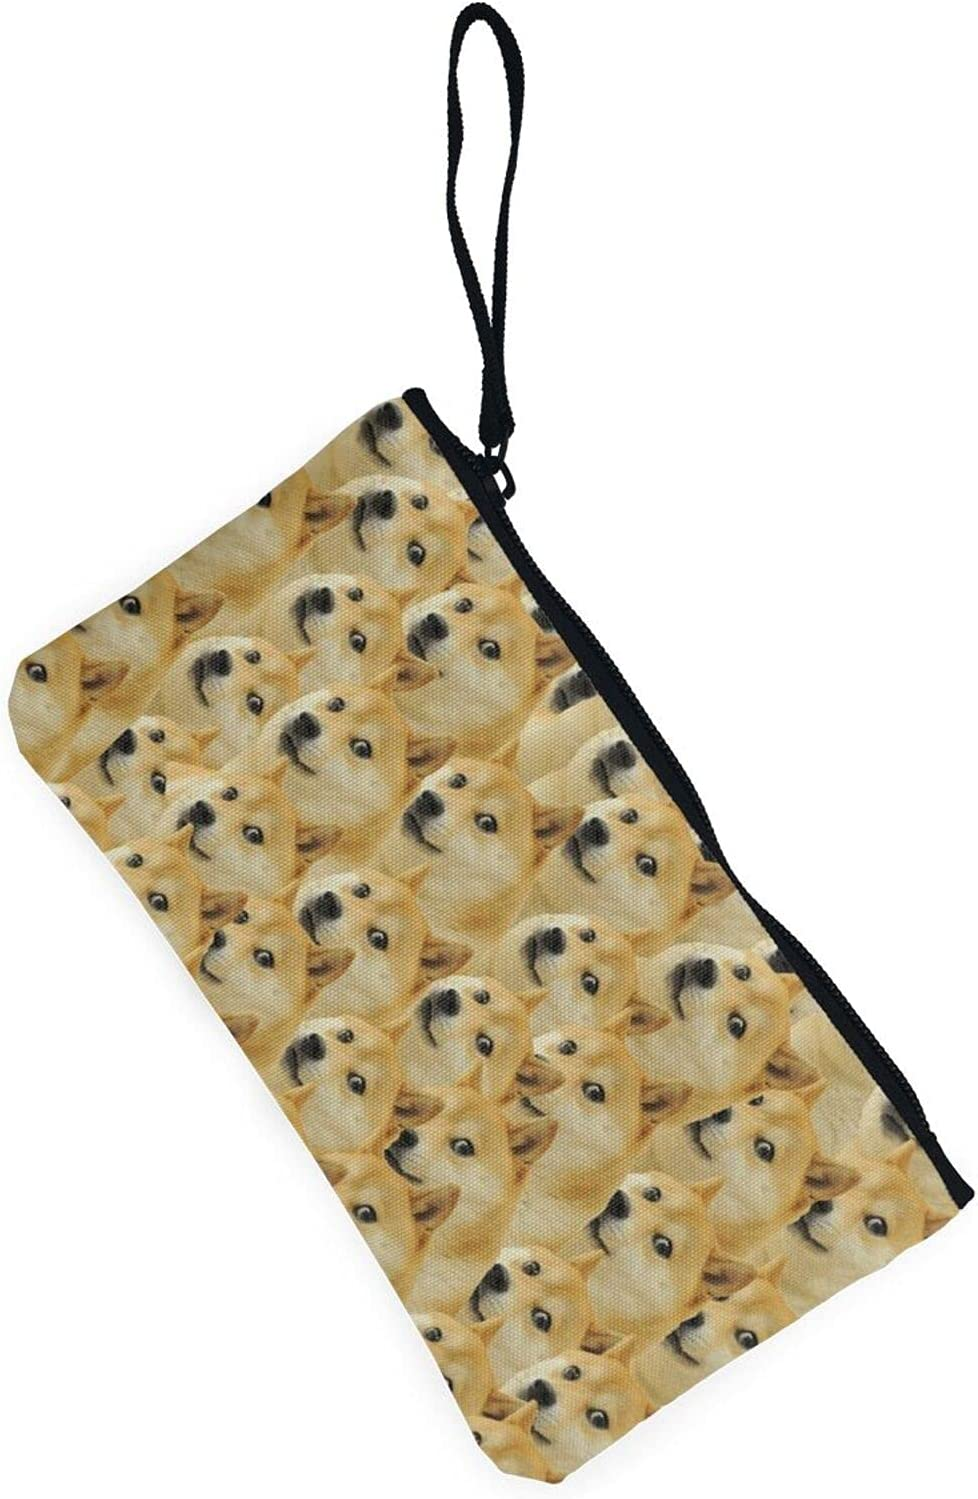 AORRUAM Funny dog face Canvas Coin Purse,Canvas Zipper Pencil Cases,Canvas Change Purse Pouch Mini Wallet Coin Bag